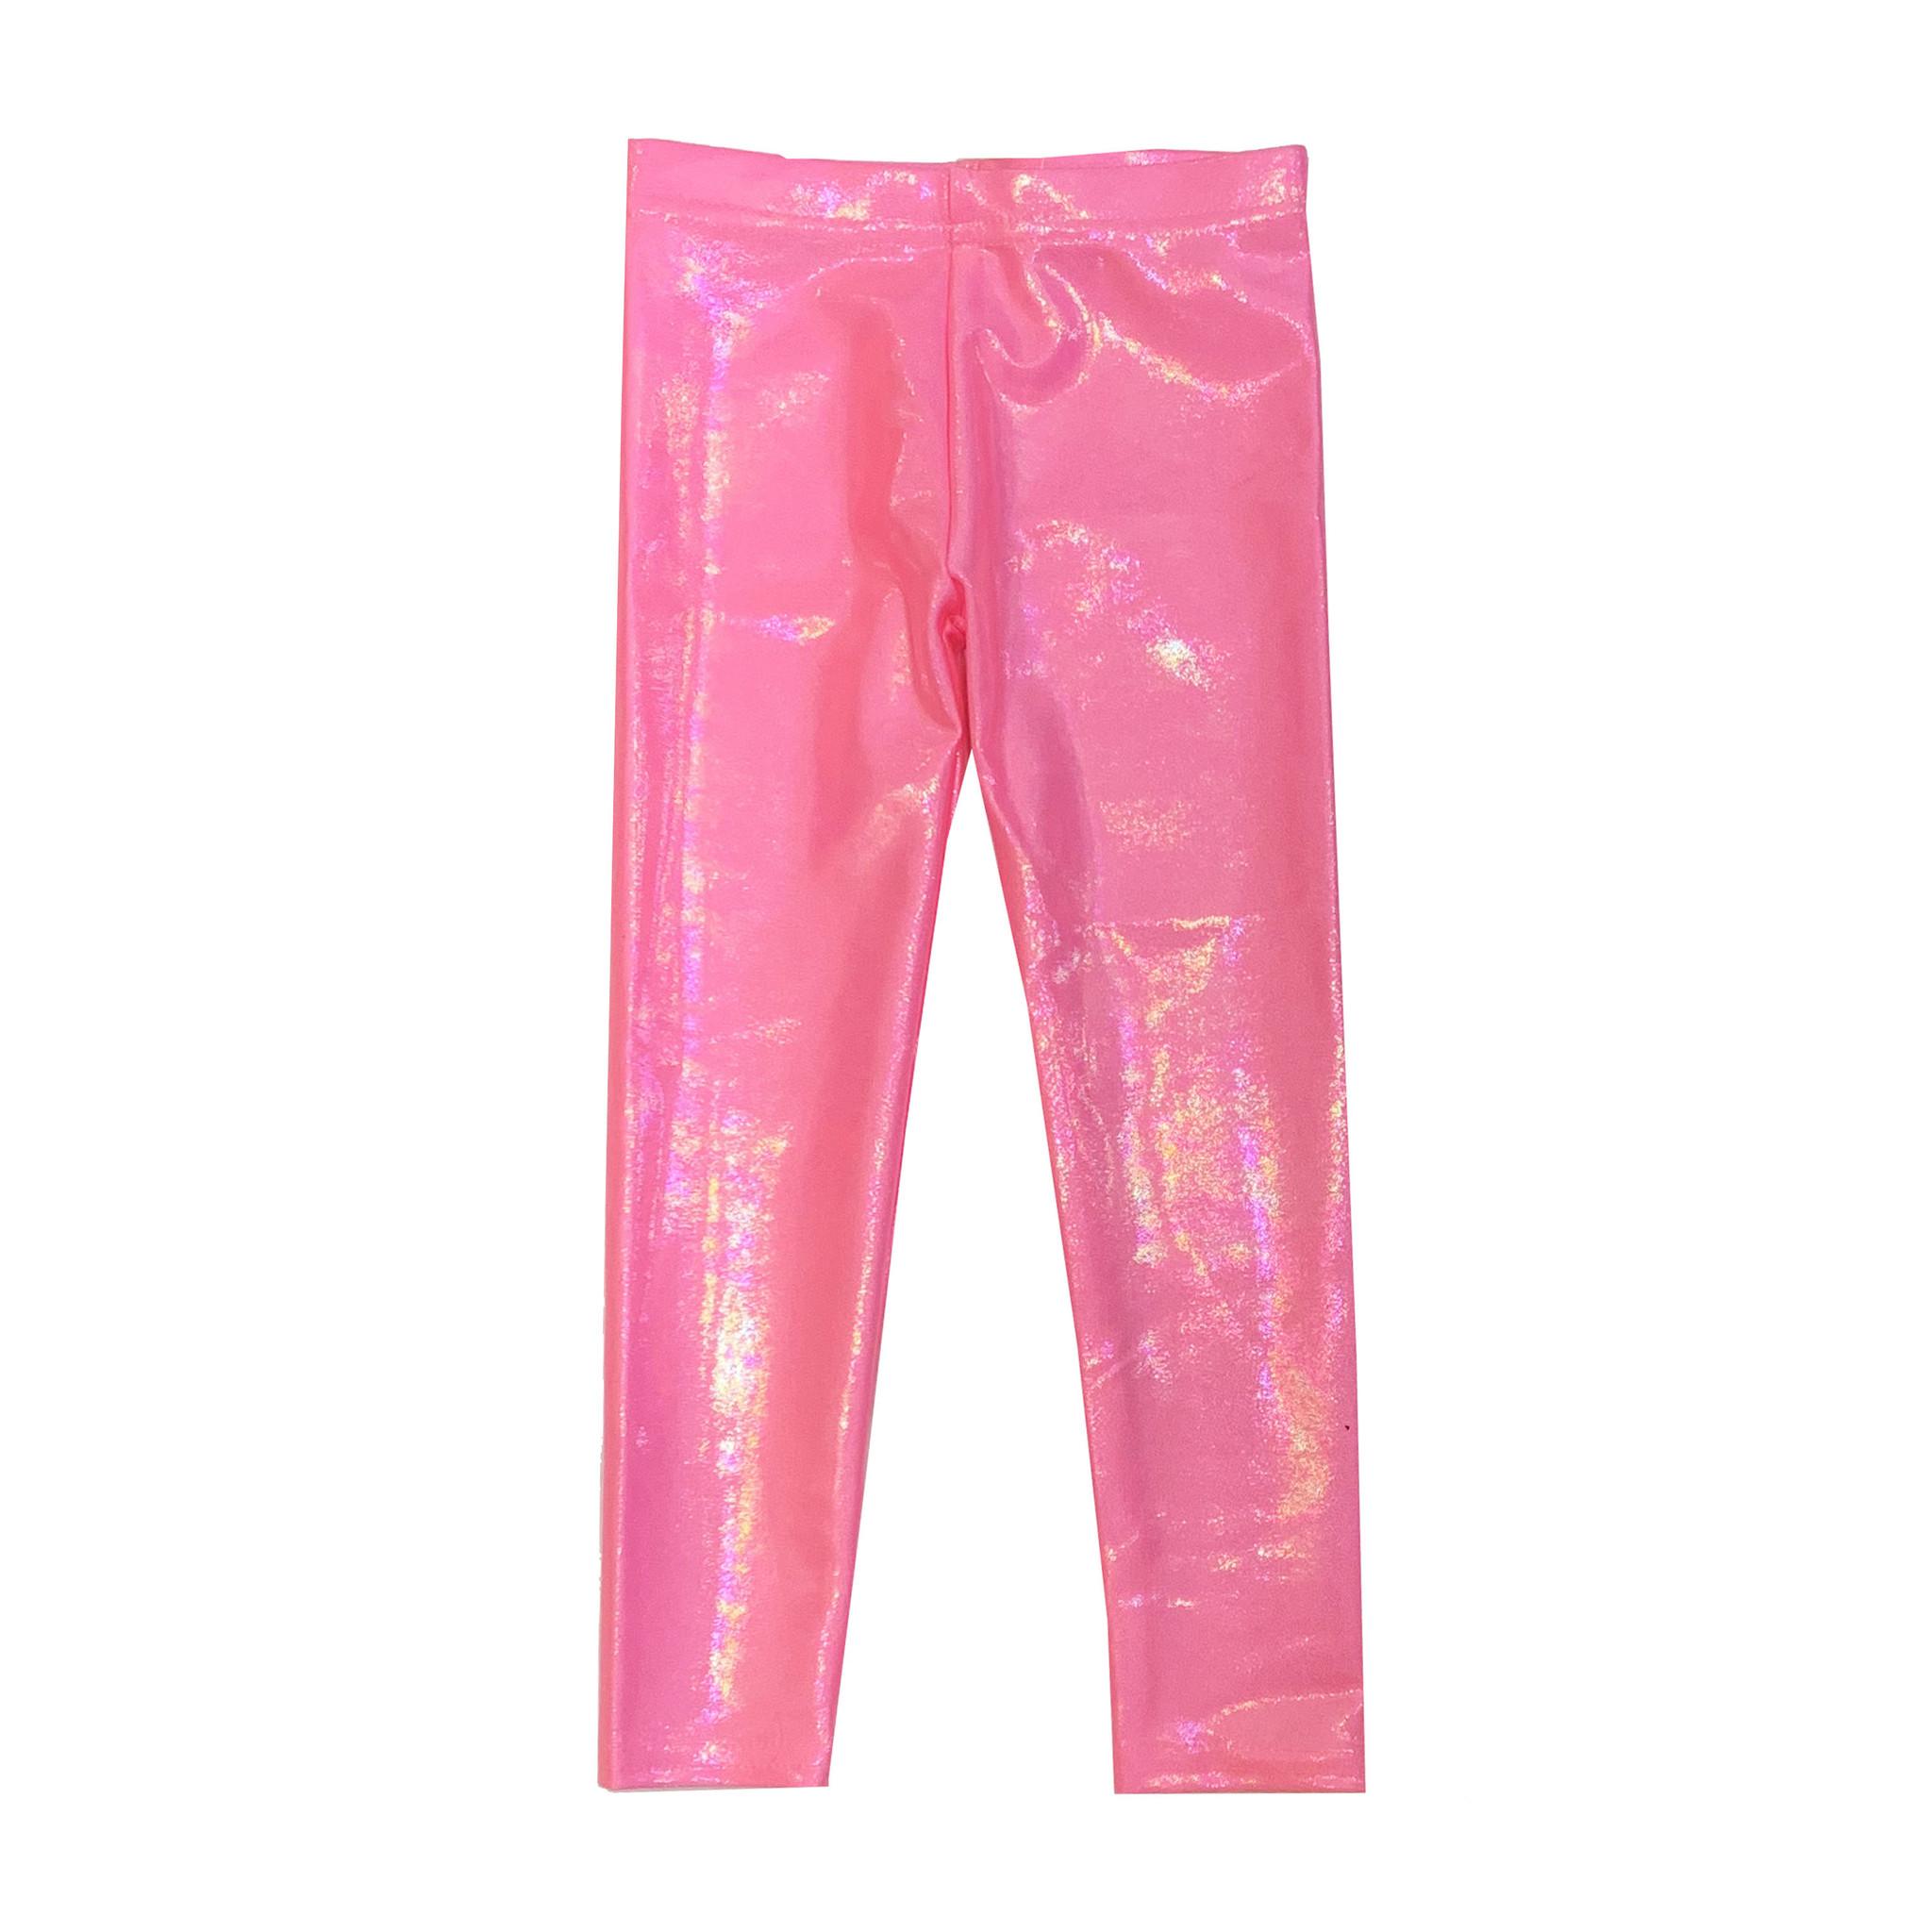 Dori Creations Shiny Bubblegum Legging